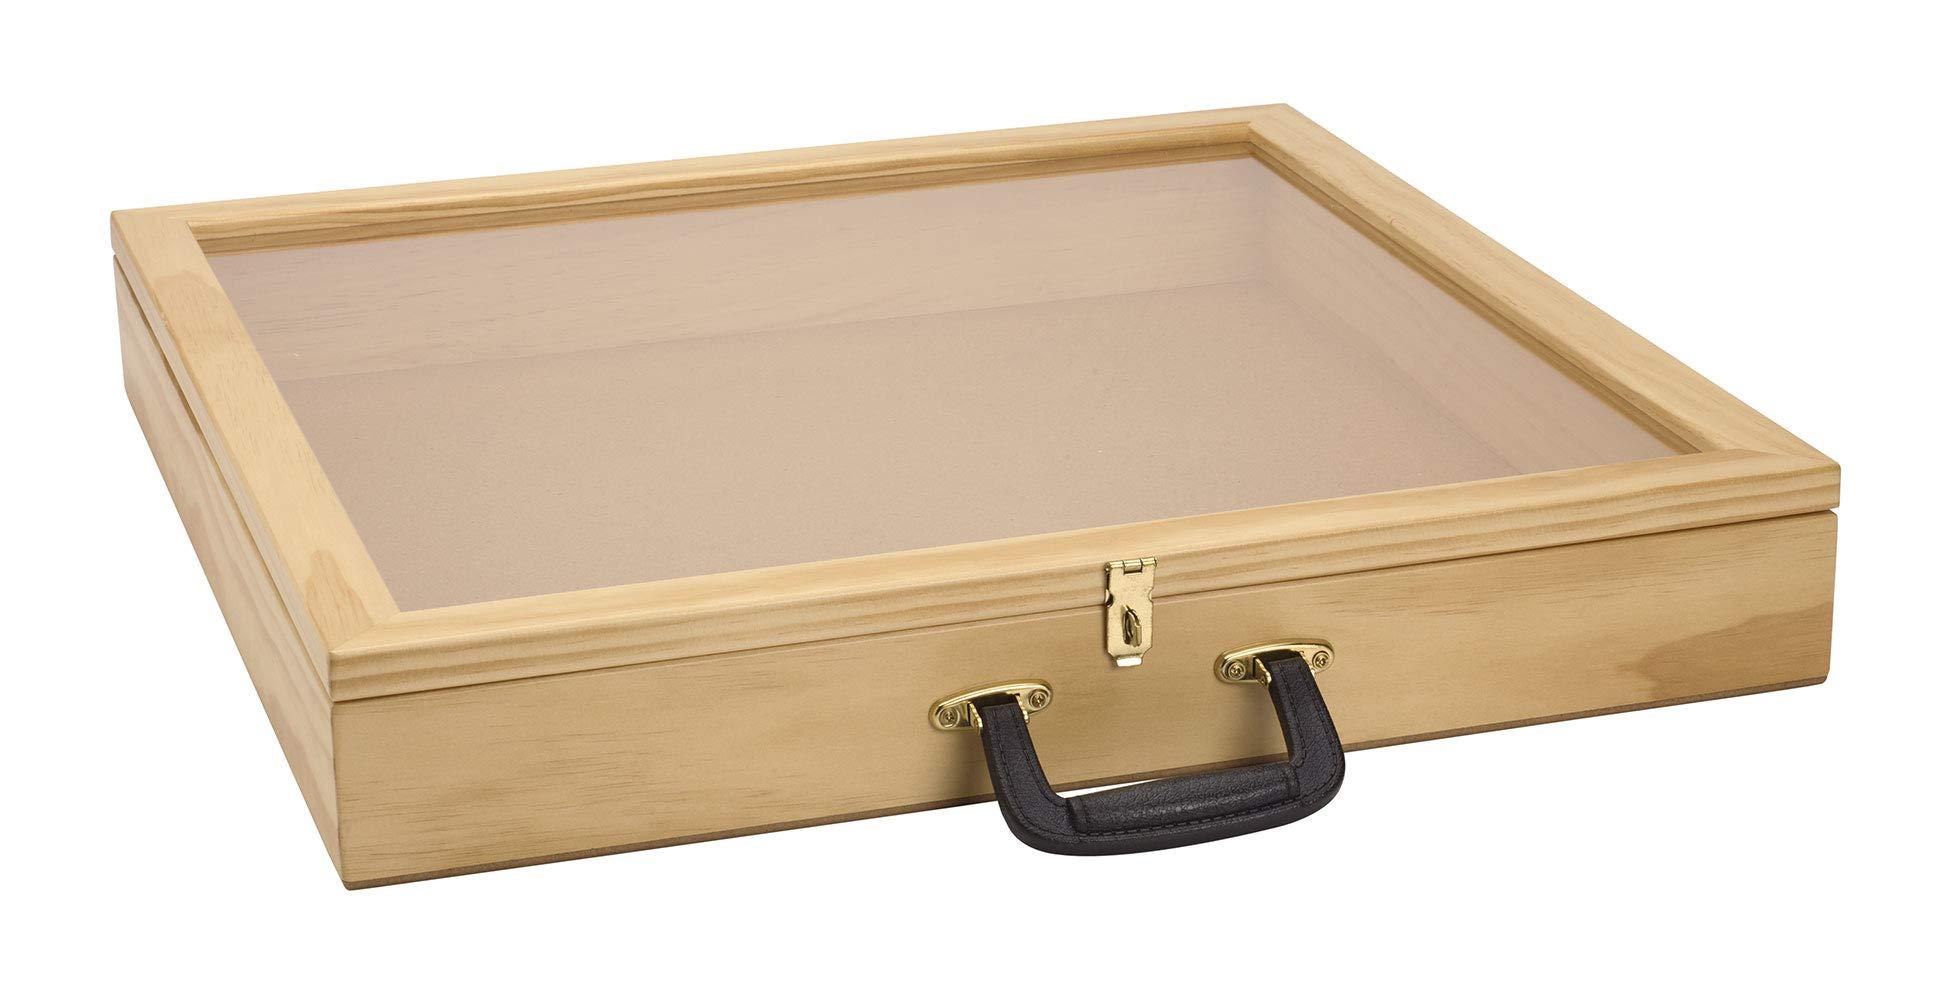 SSWBasics 24 inch Portable Natural Pine Wood Countertop Display Case - 24'' W x 24'' L x 3'' D by SSWBasics